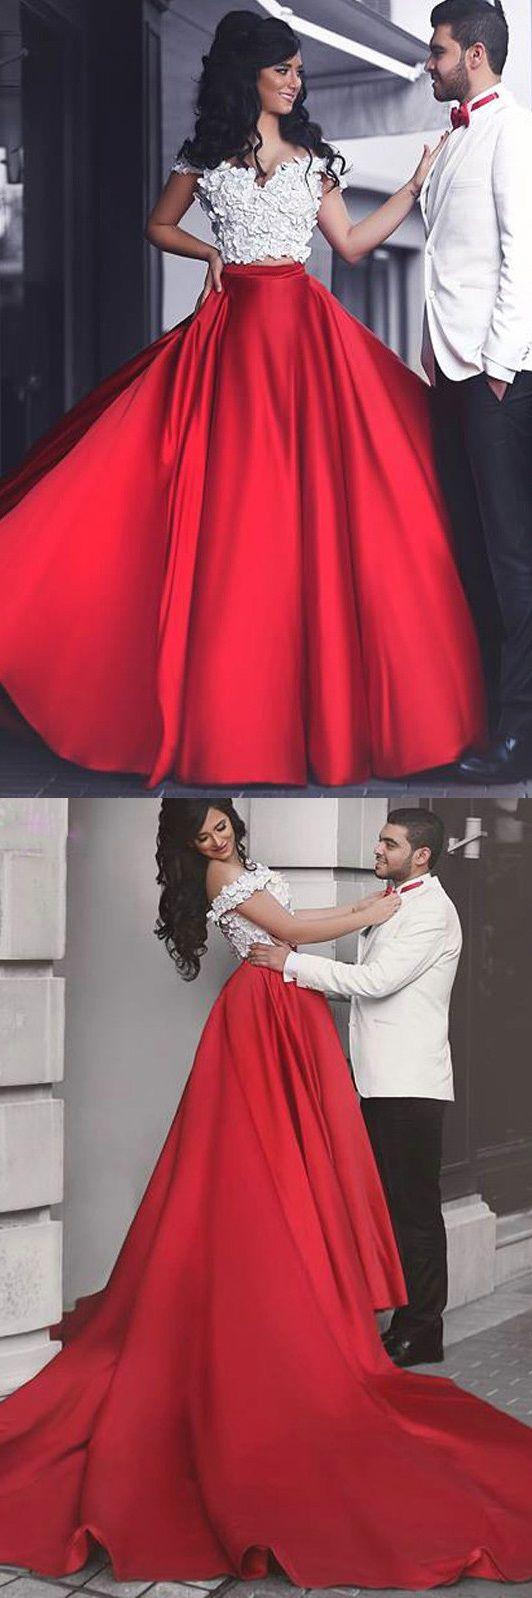 Chic flowers long red satin prom dress wedding jewelry